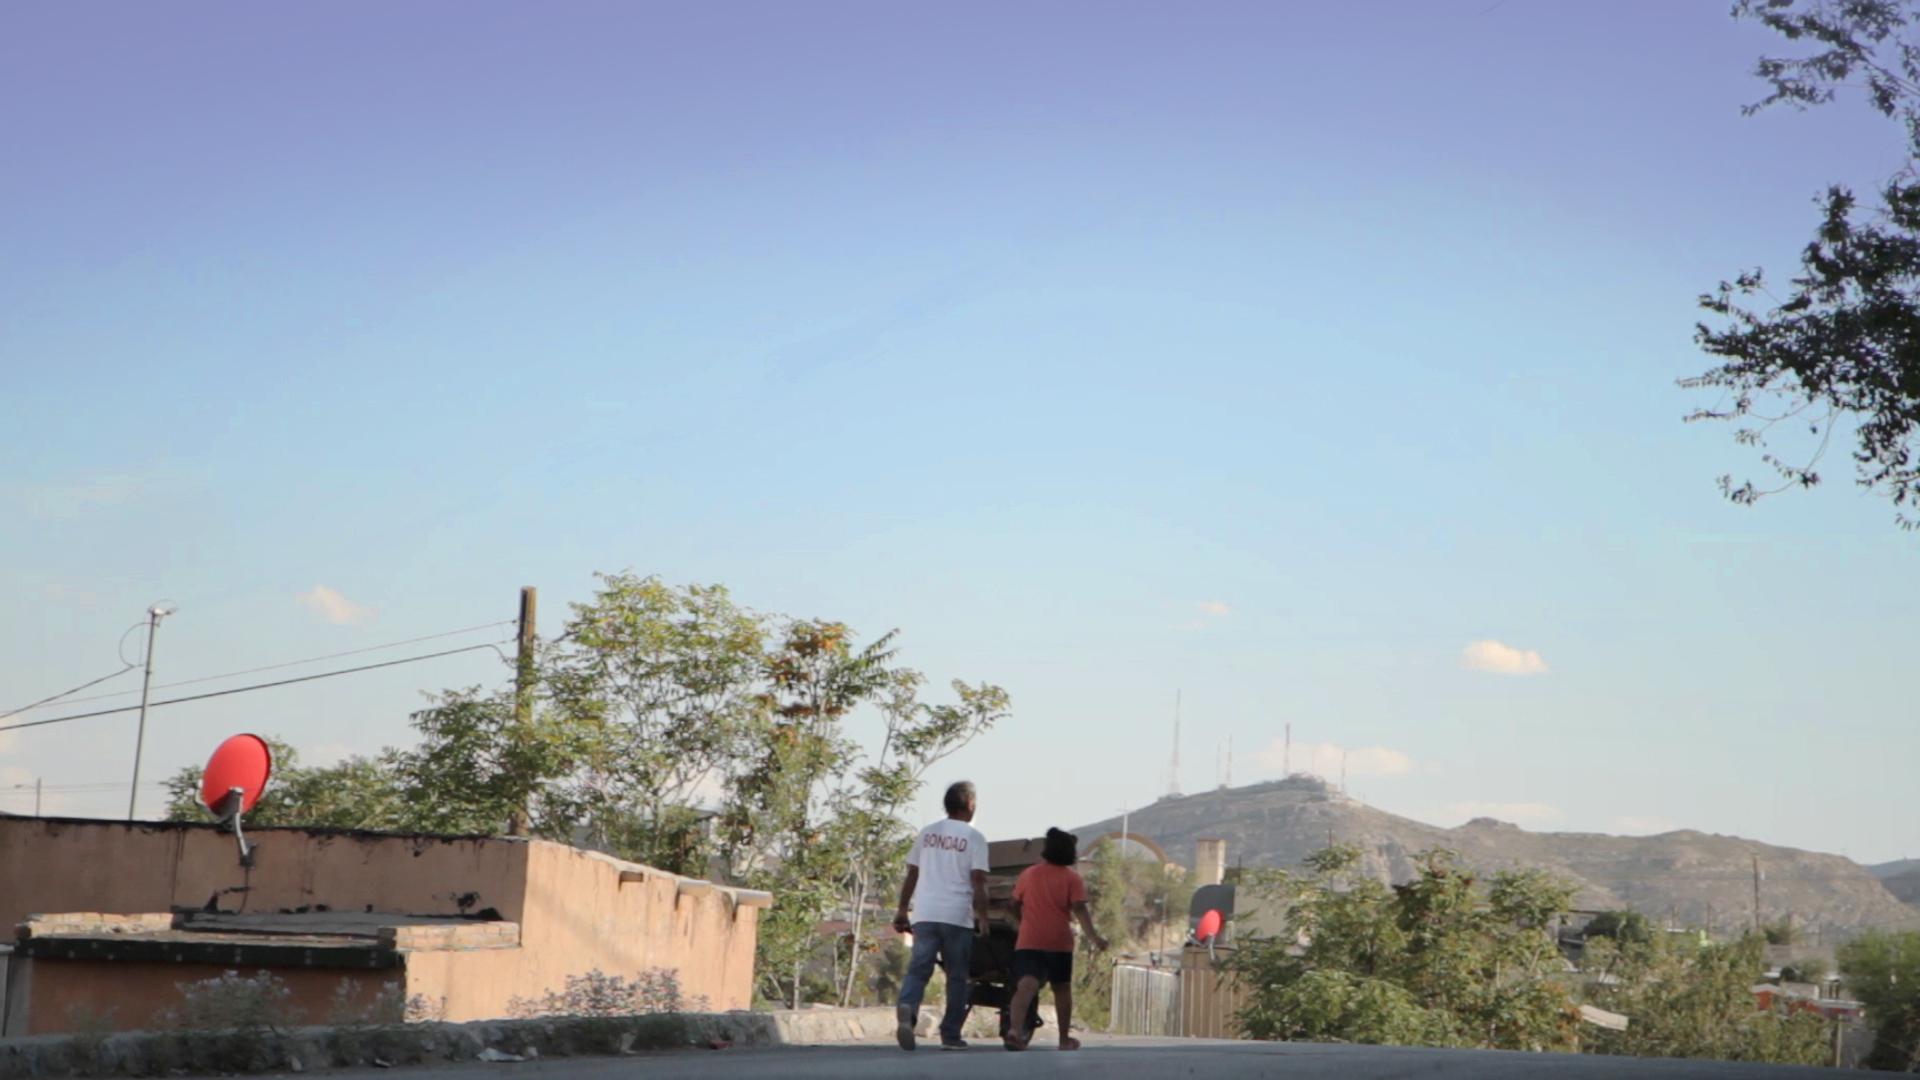 El Chacharero A Film by Krisstian de Lara